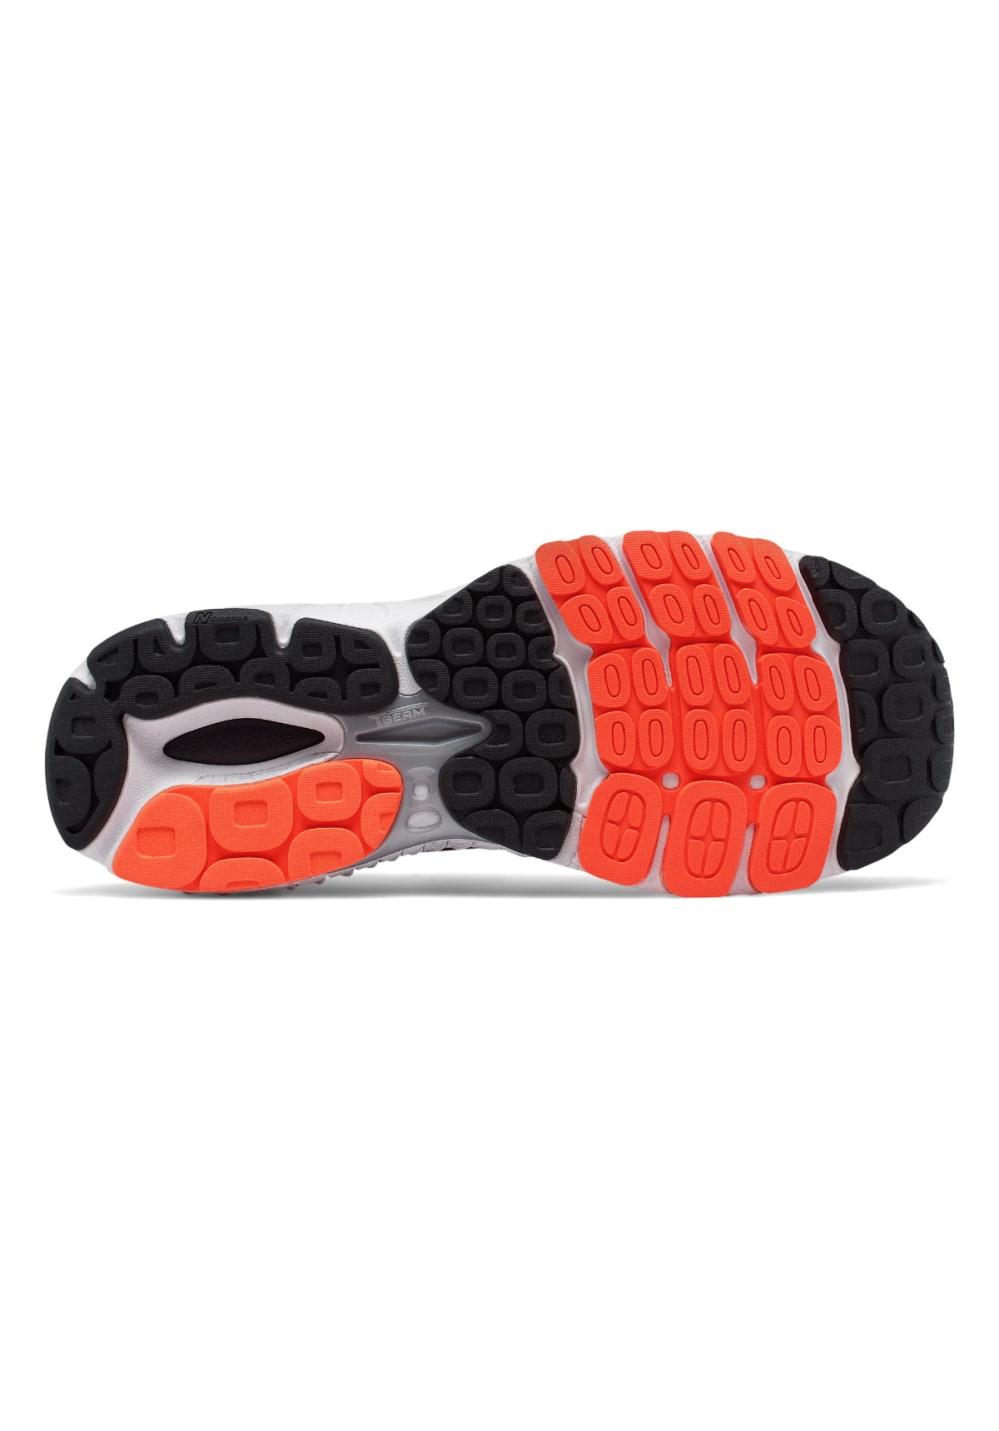 348a5b4f397e7 New Balance M 860 V7 D - Running shoes for Men - Blue